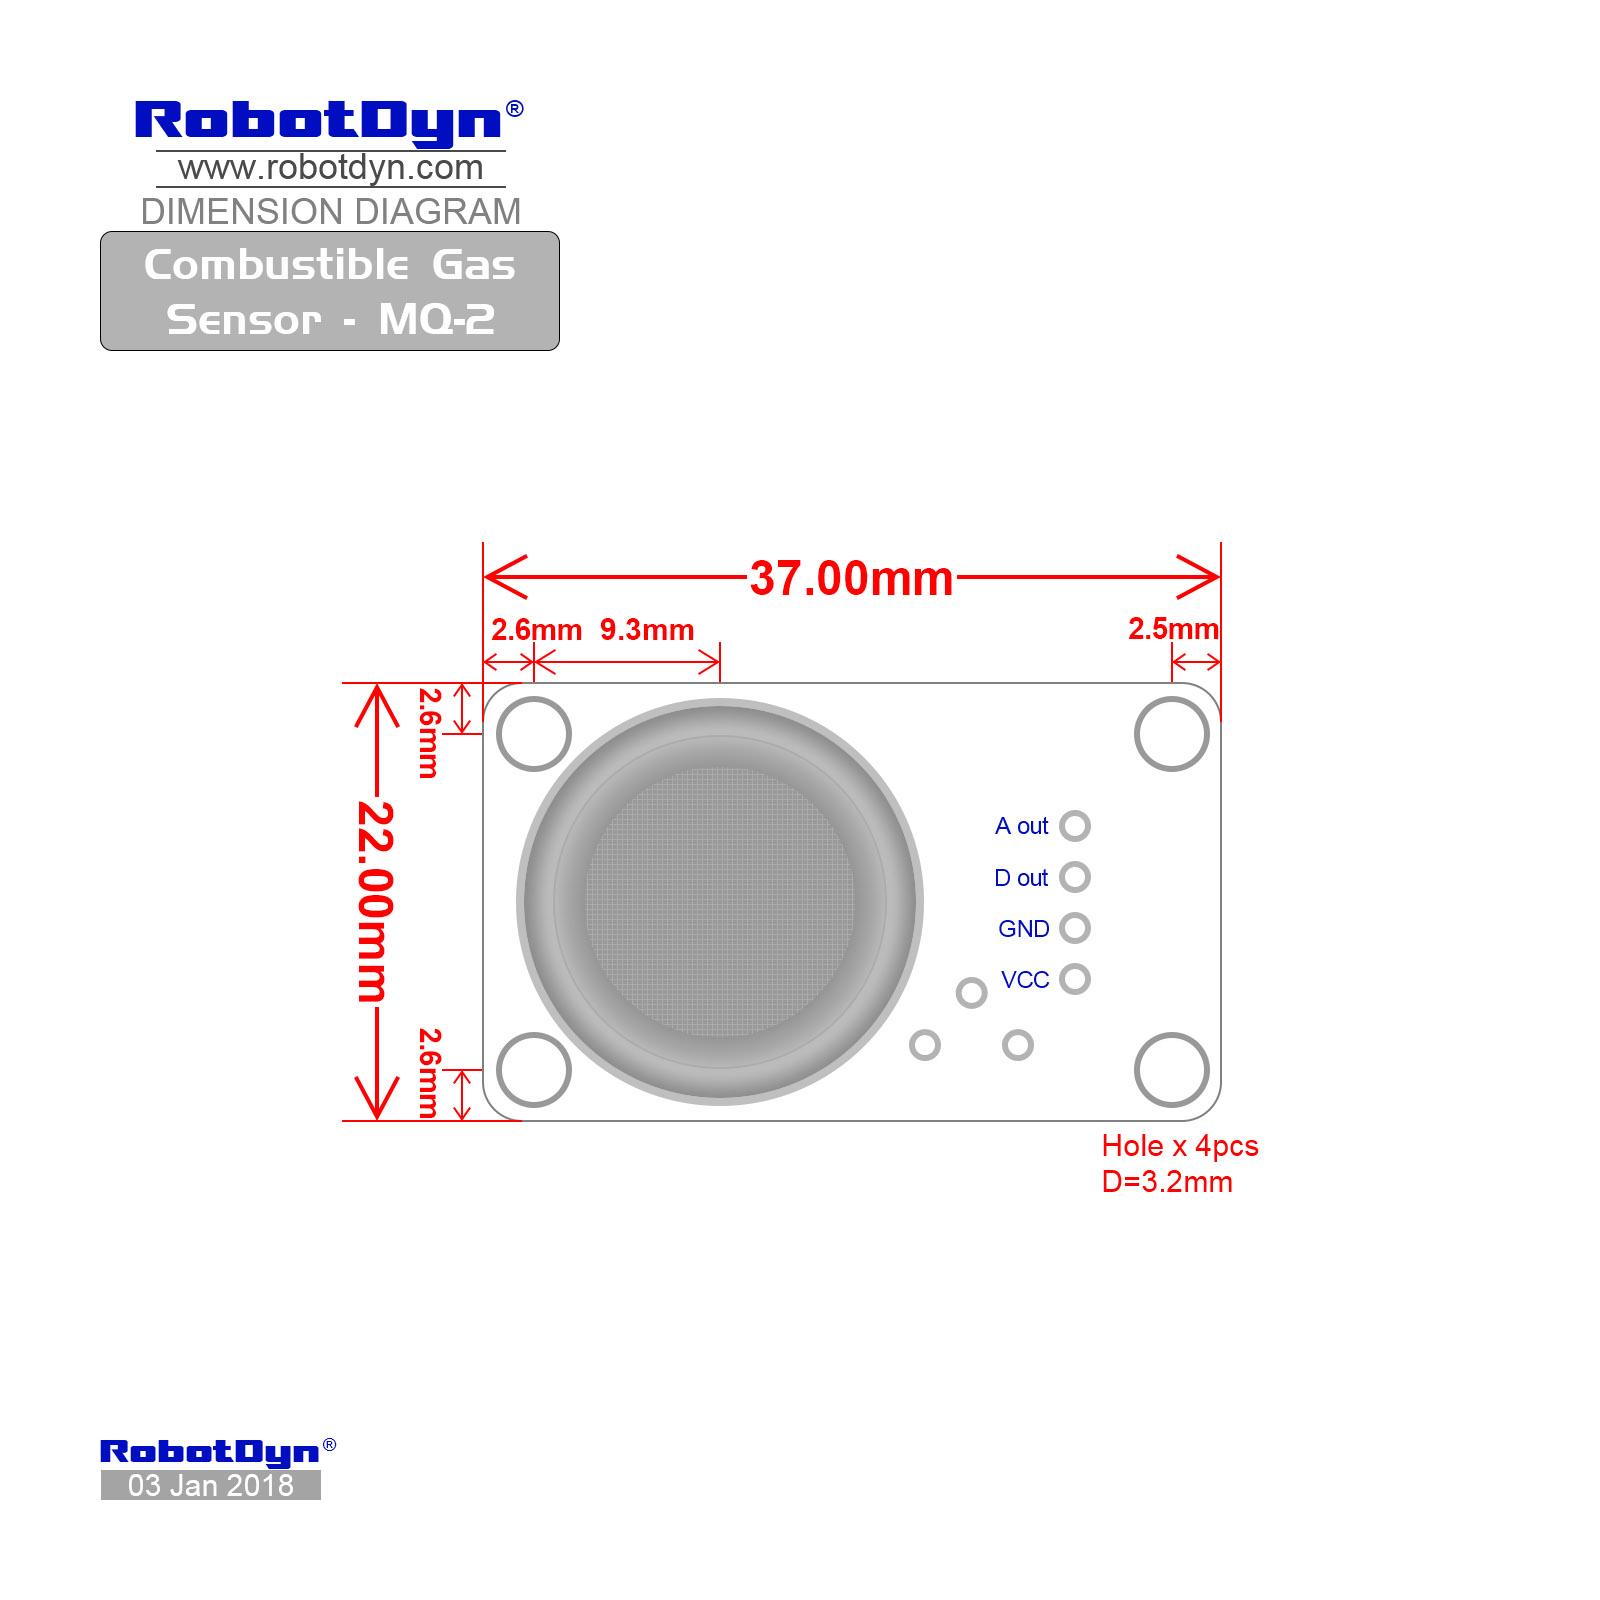 Combustible Gas Sensor Mq 2 Green Electronics Store 6 Circuit Diagram Dimensions